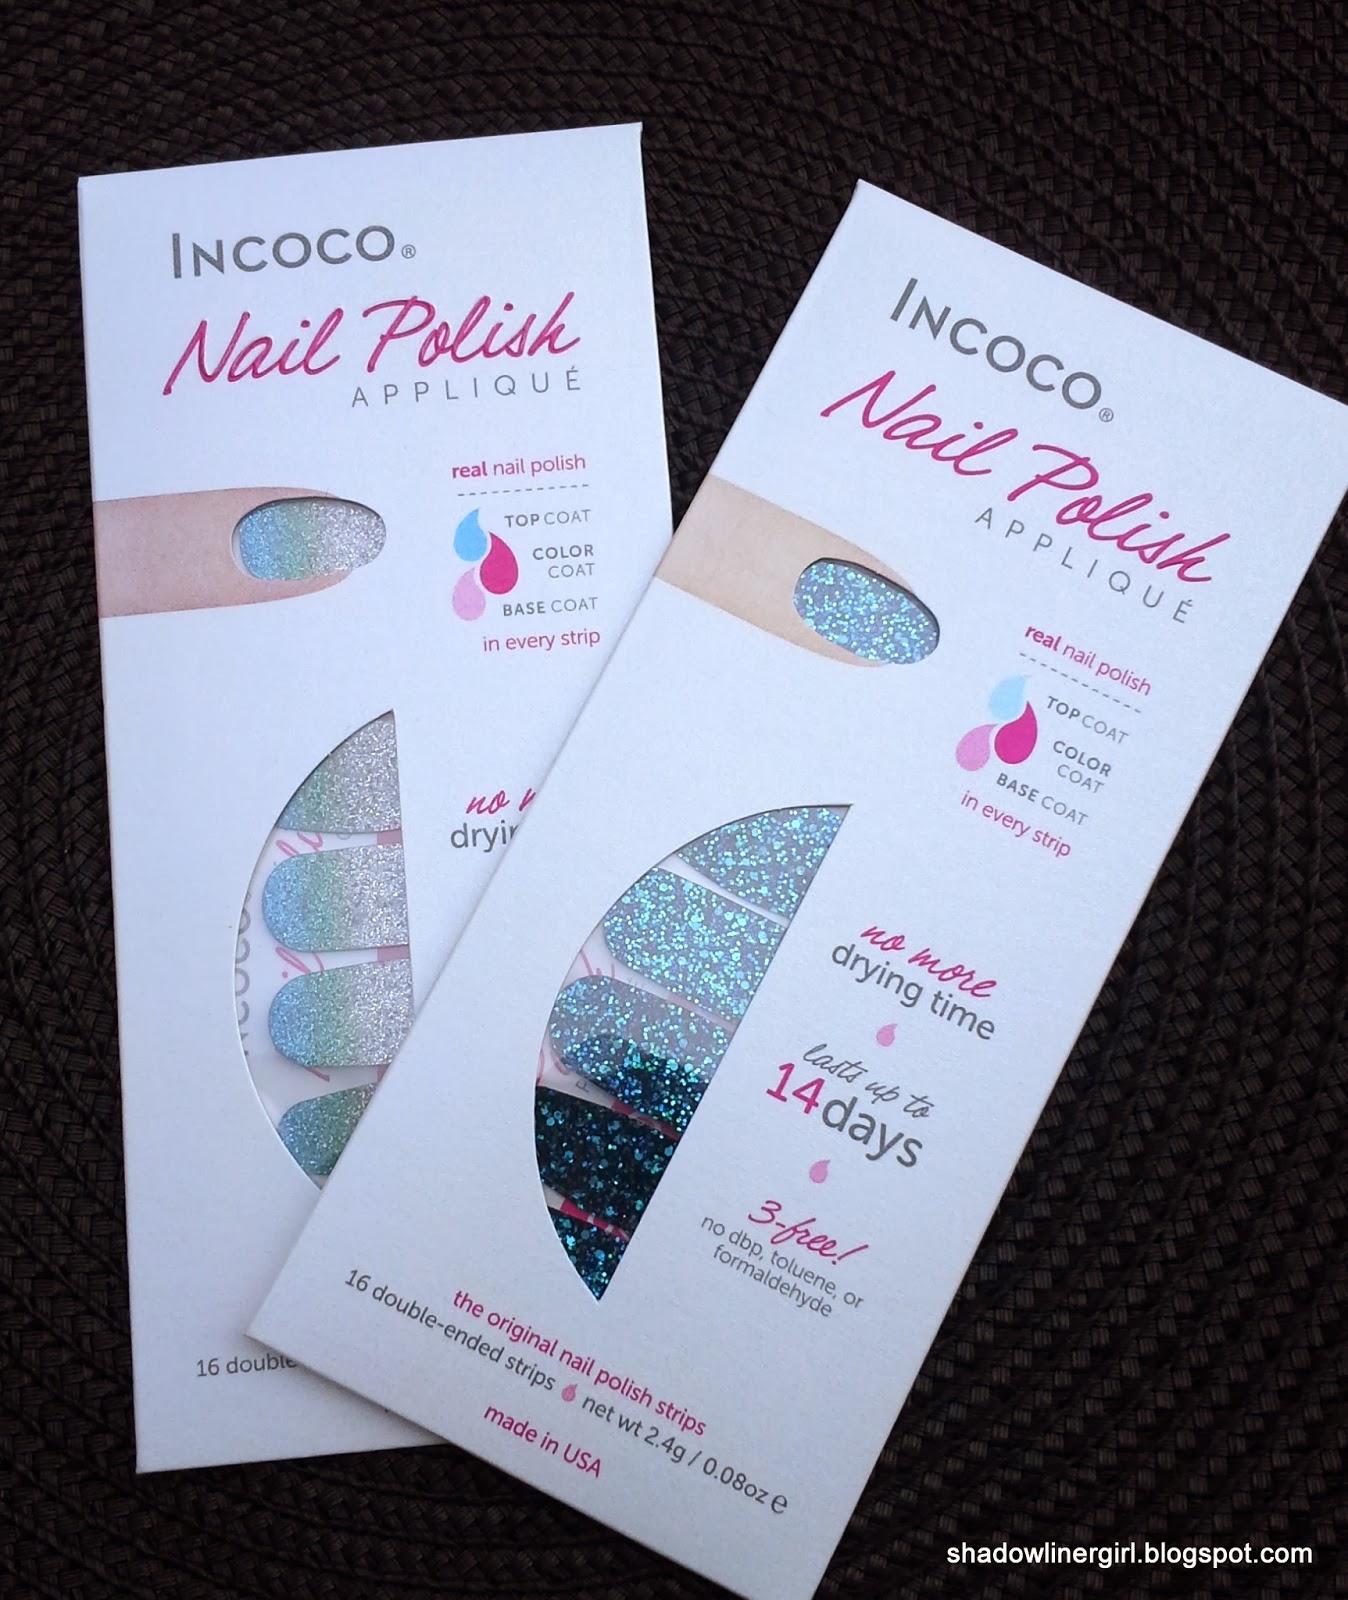 Incoco Nail Polish Appliques Review